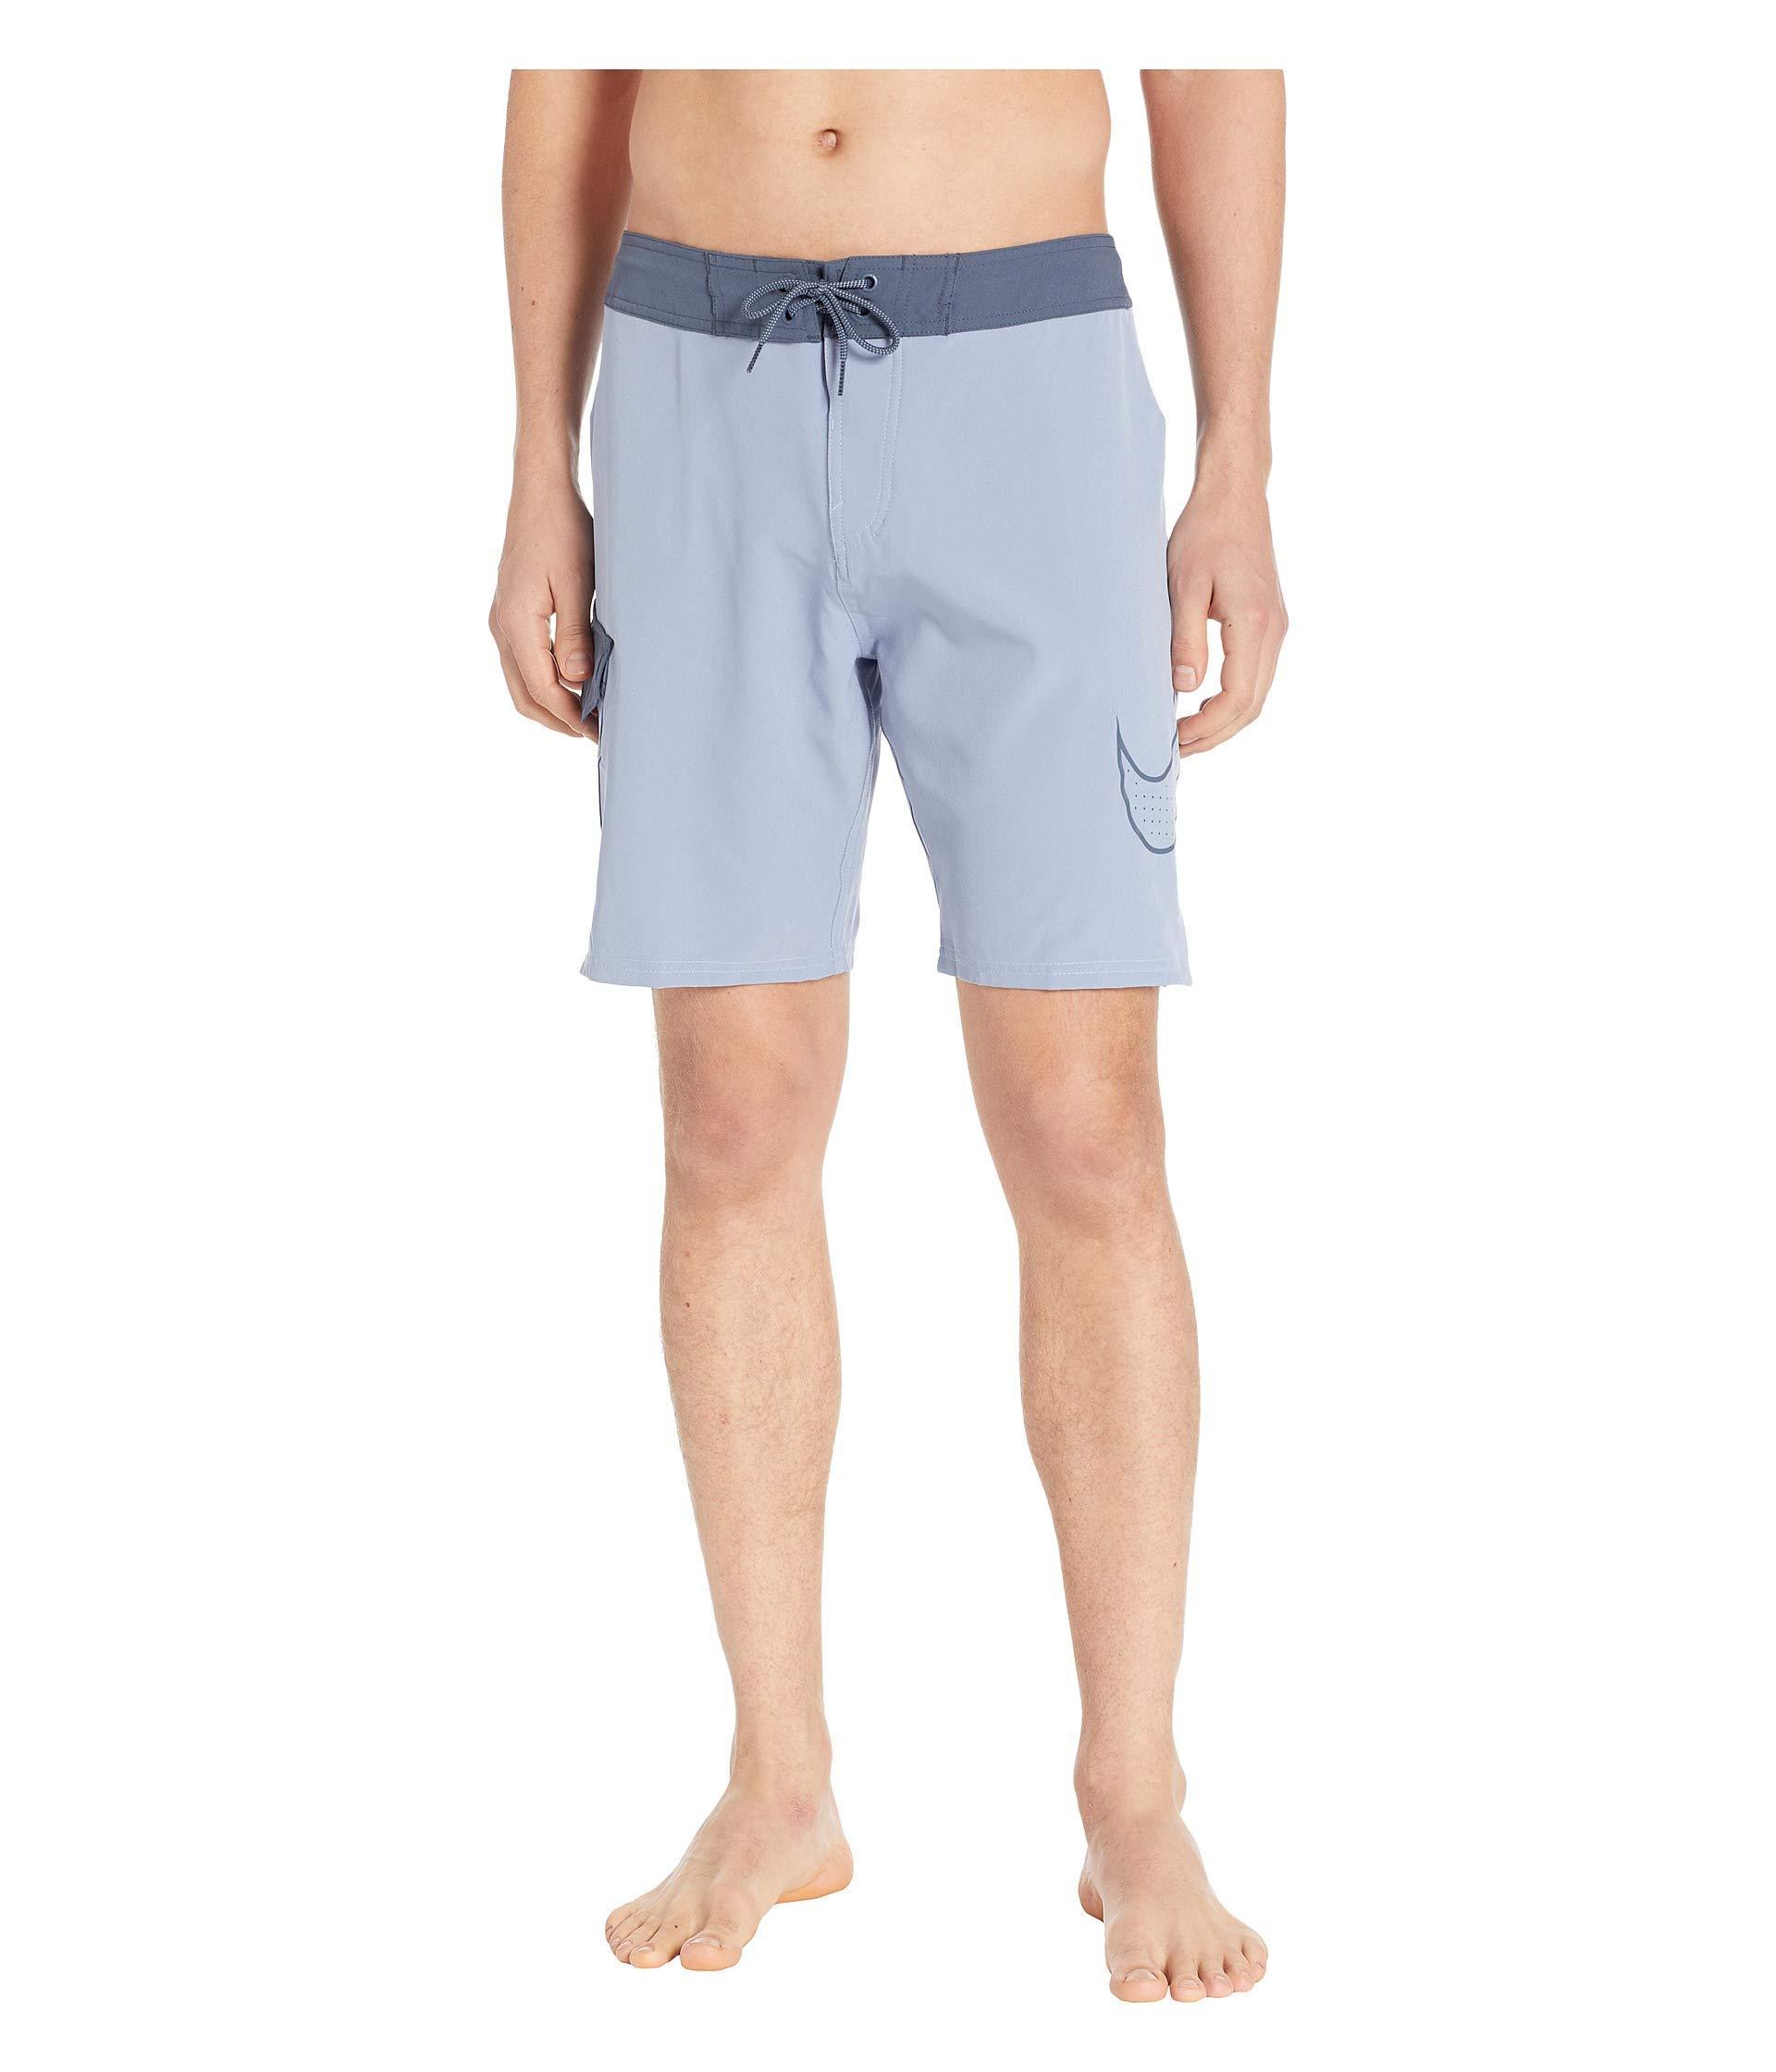 da629f7ffeefd Nike. Blue 9 Perforated Swoosh Drift Boardshorts (black) Men's Swimwear